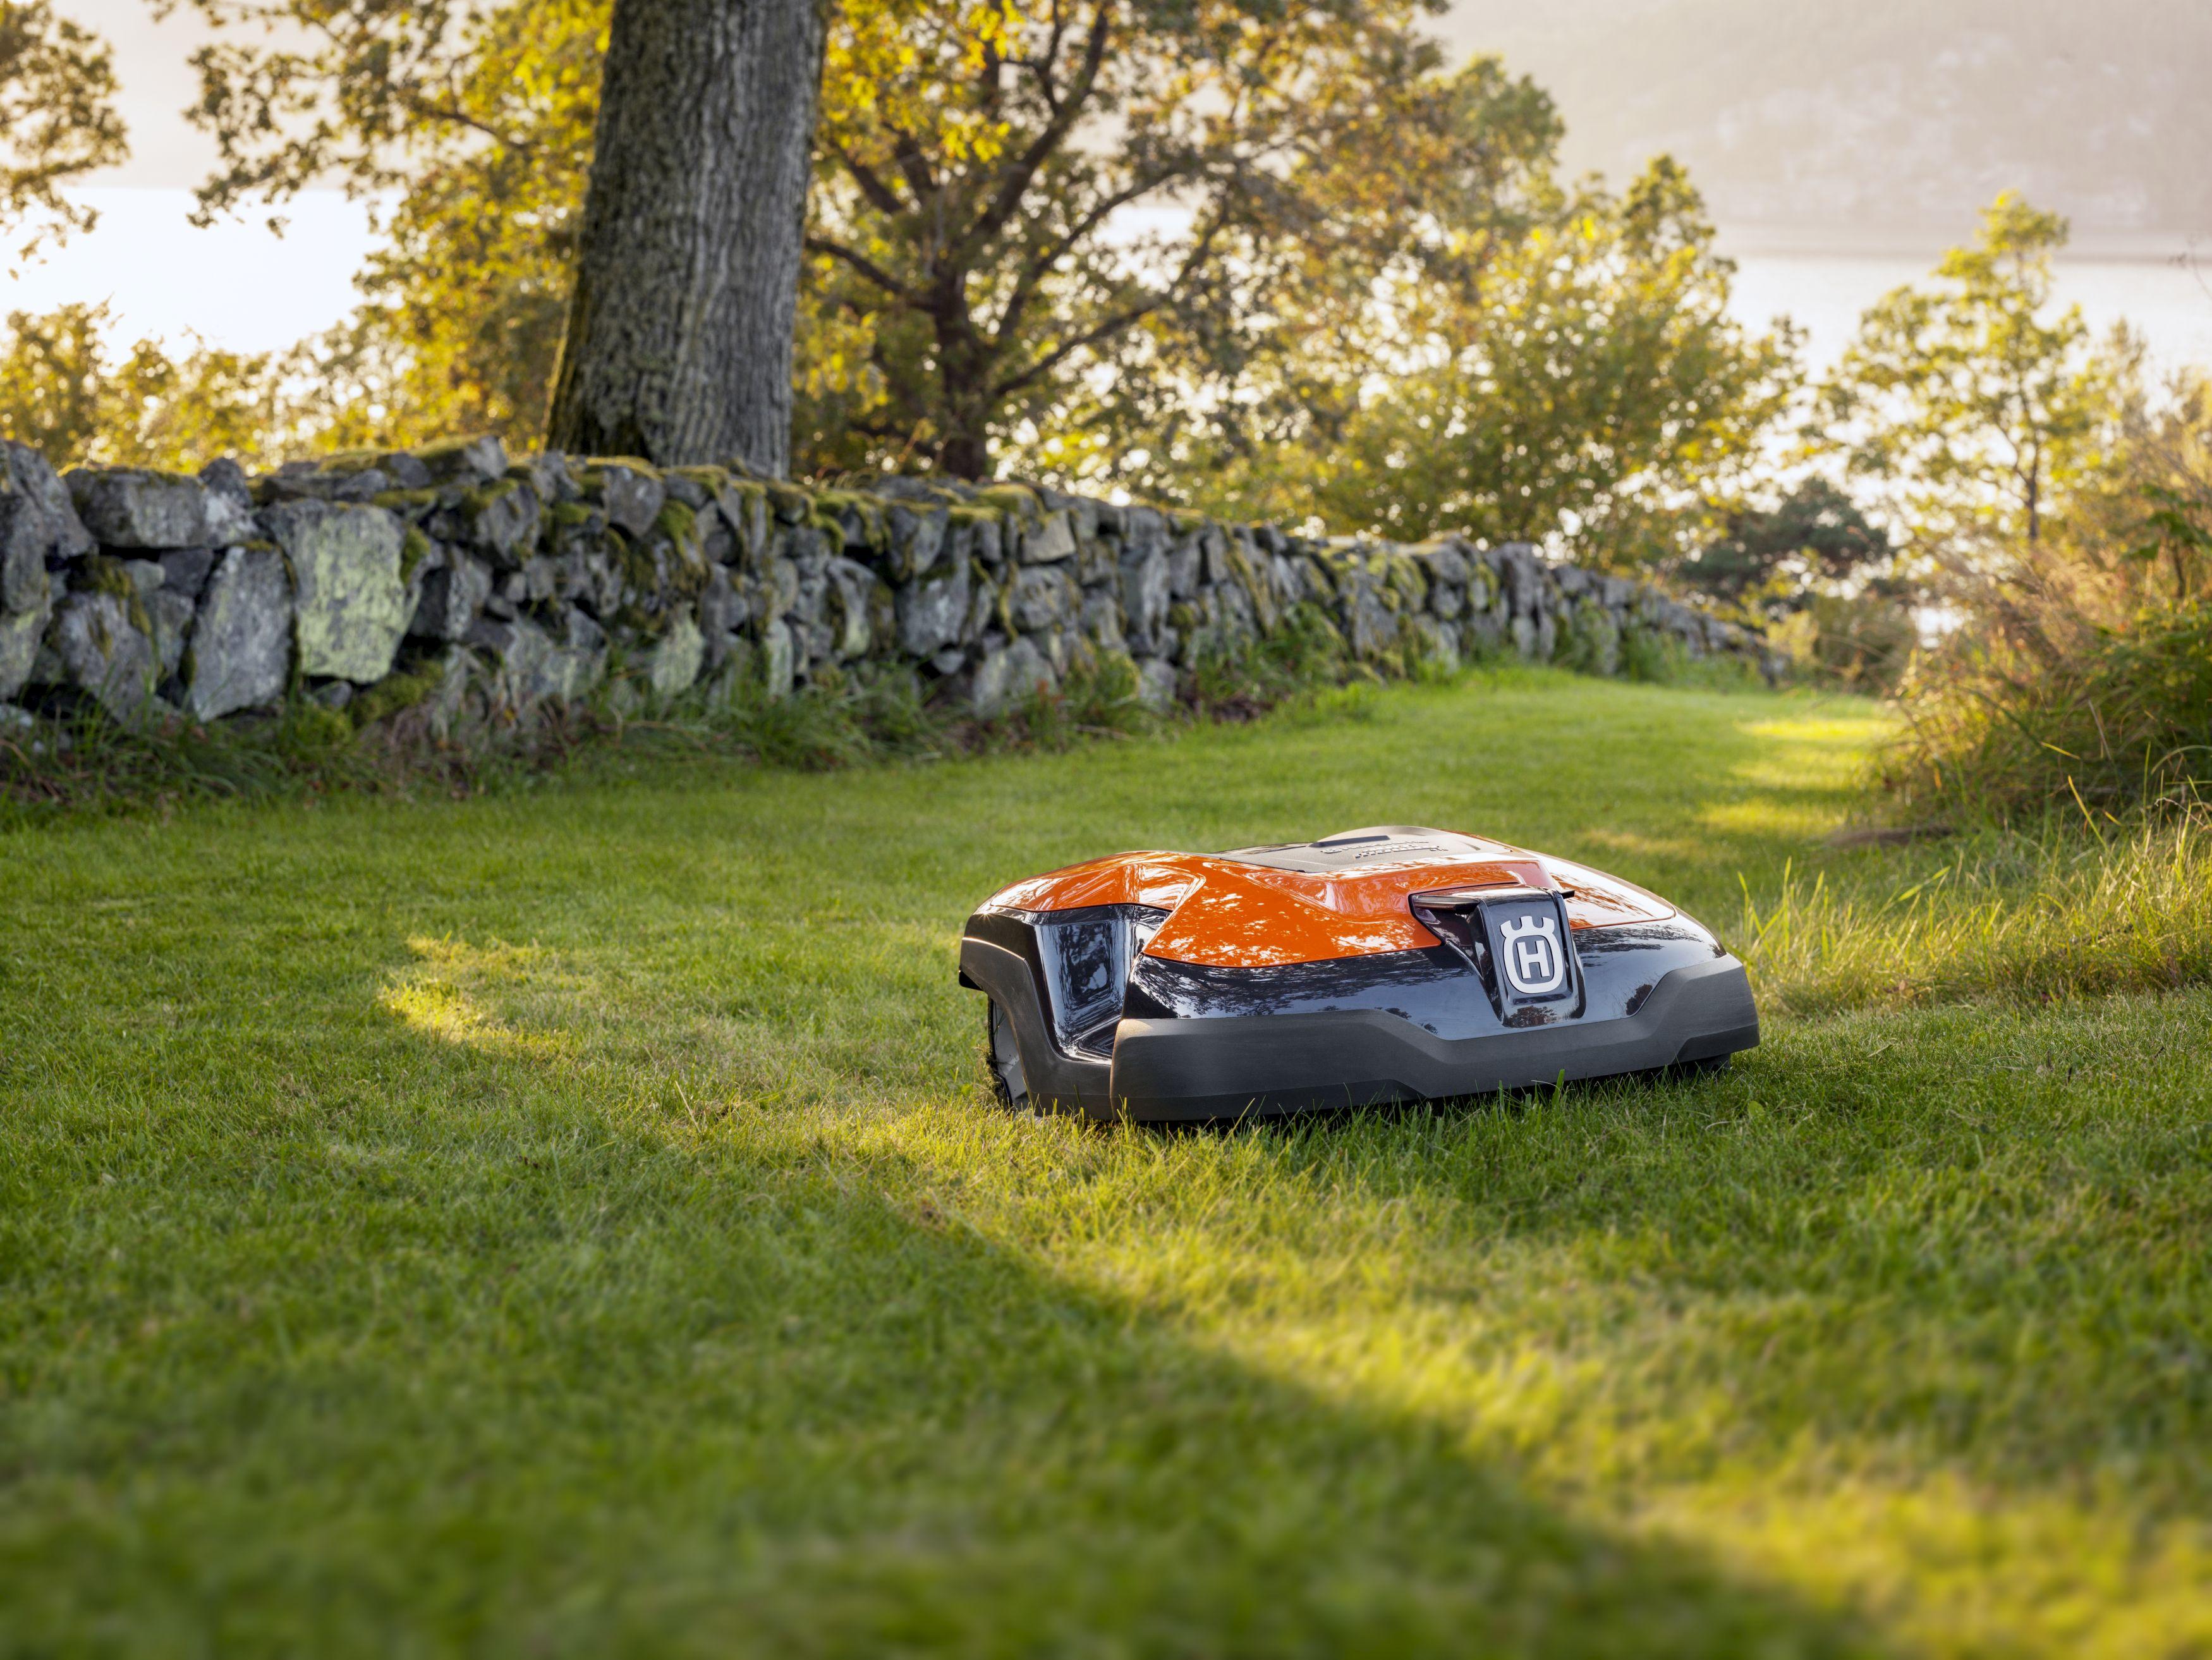 robot tondeuse husqvarna automower 315 mod le 2018. Black Bedroom Furniture Sets. Home Design Ideas